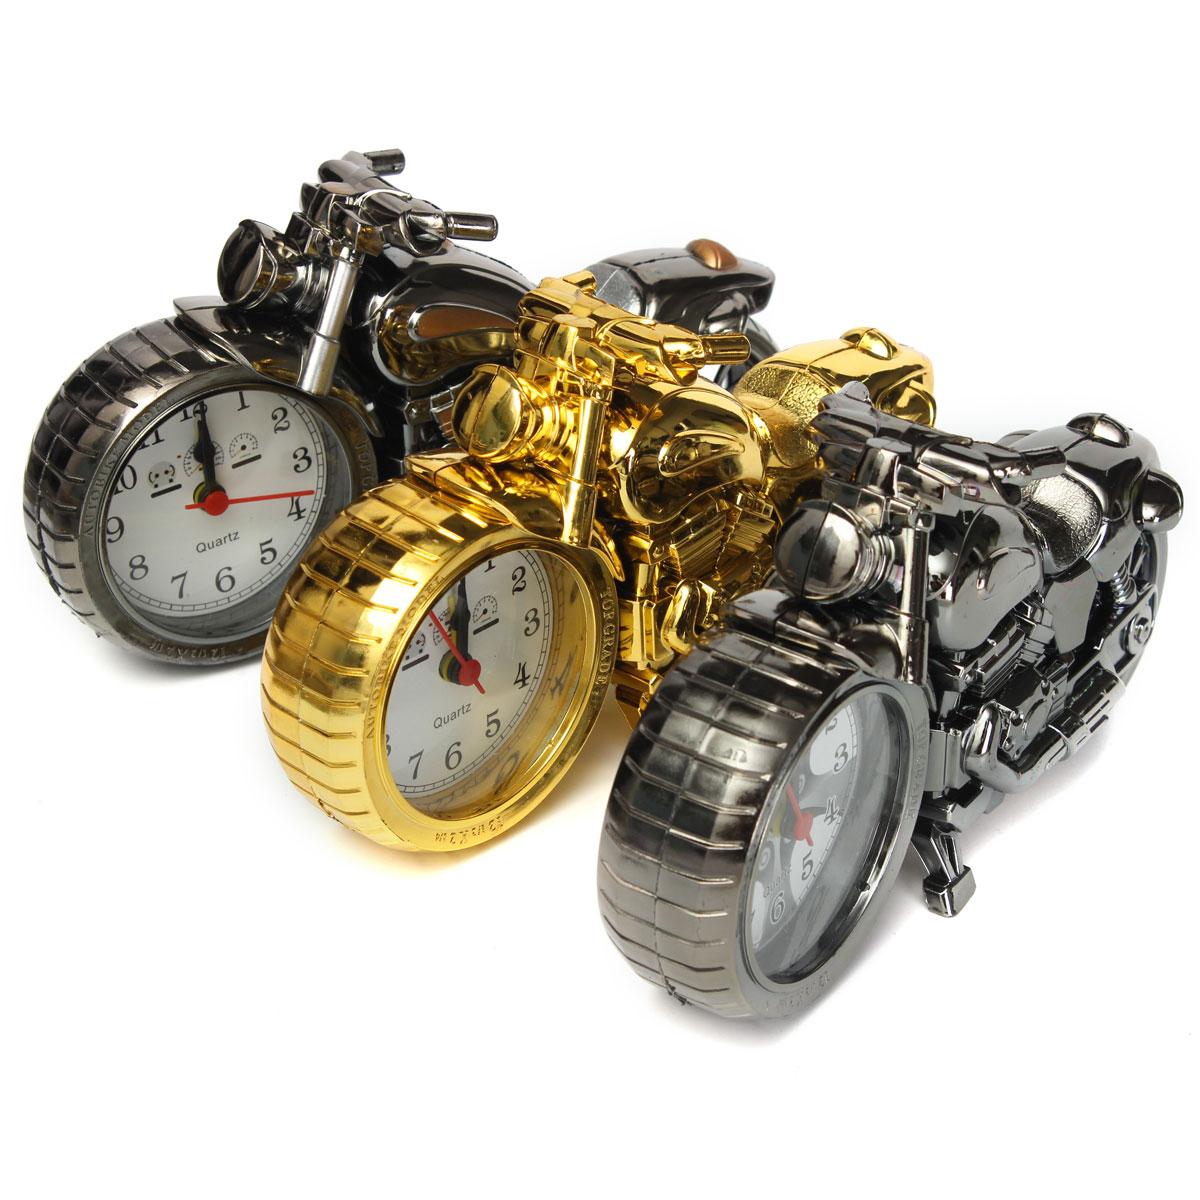 Charminer Plastic Motorcycle Motorbike Quartz Alarm Clock Home Household Furnishing Decor Gift Multi-color Jet Black Gold Lovely